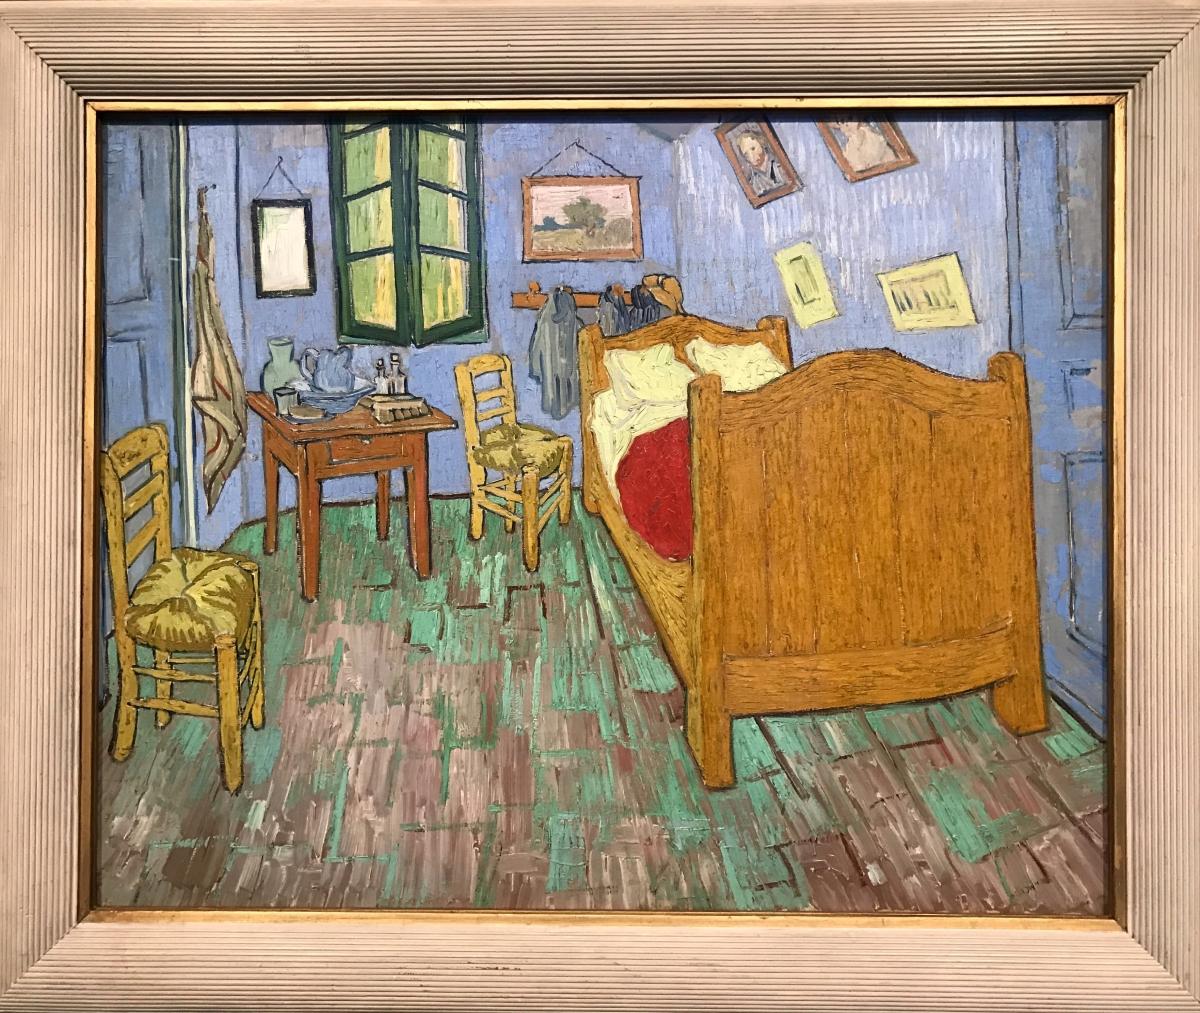 Untidy Bedroom Art: Choosing Van Gogh And An Untidy Bedroom